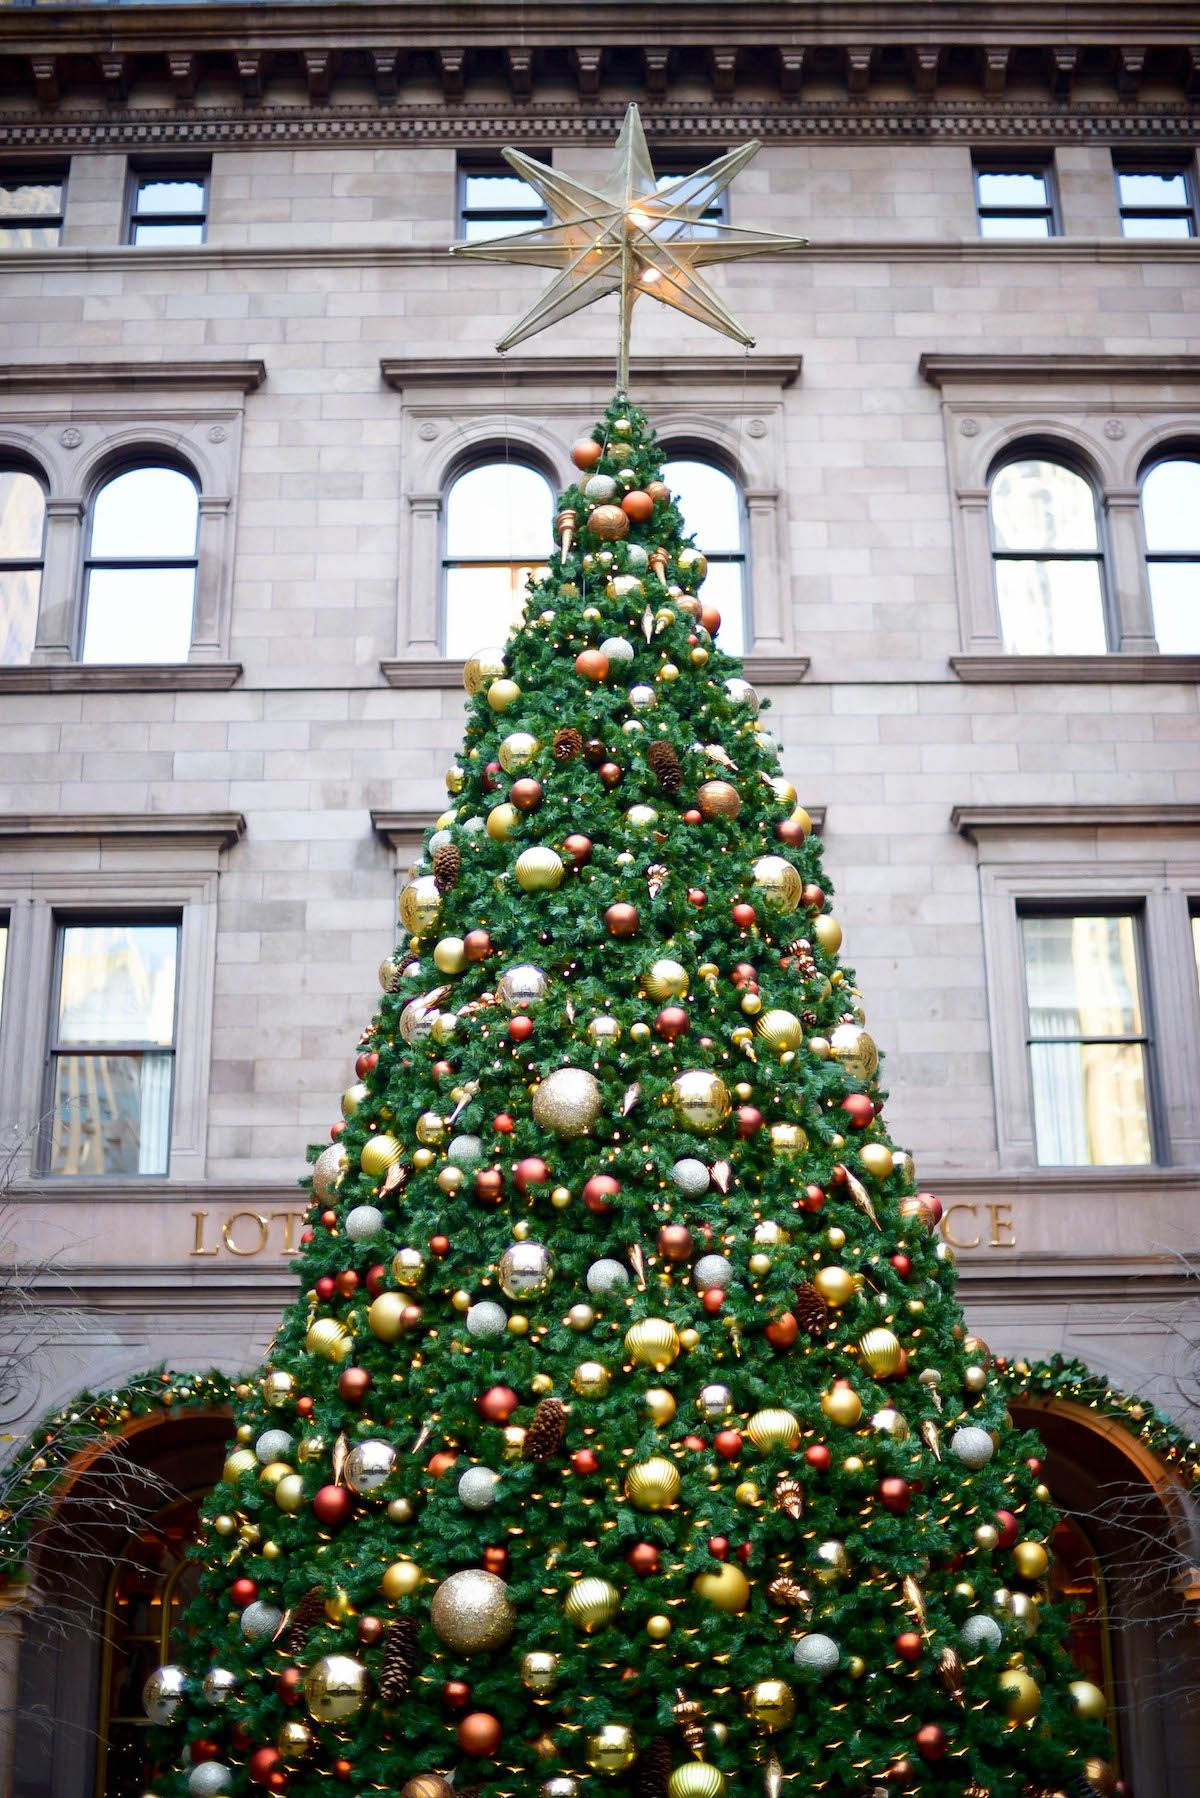 Lotte New York Palace Hotel Christmas Tree | New York City Holiday ...